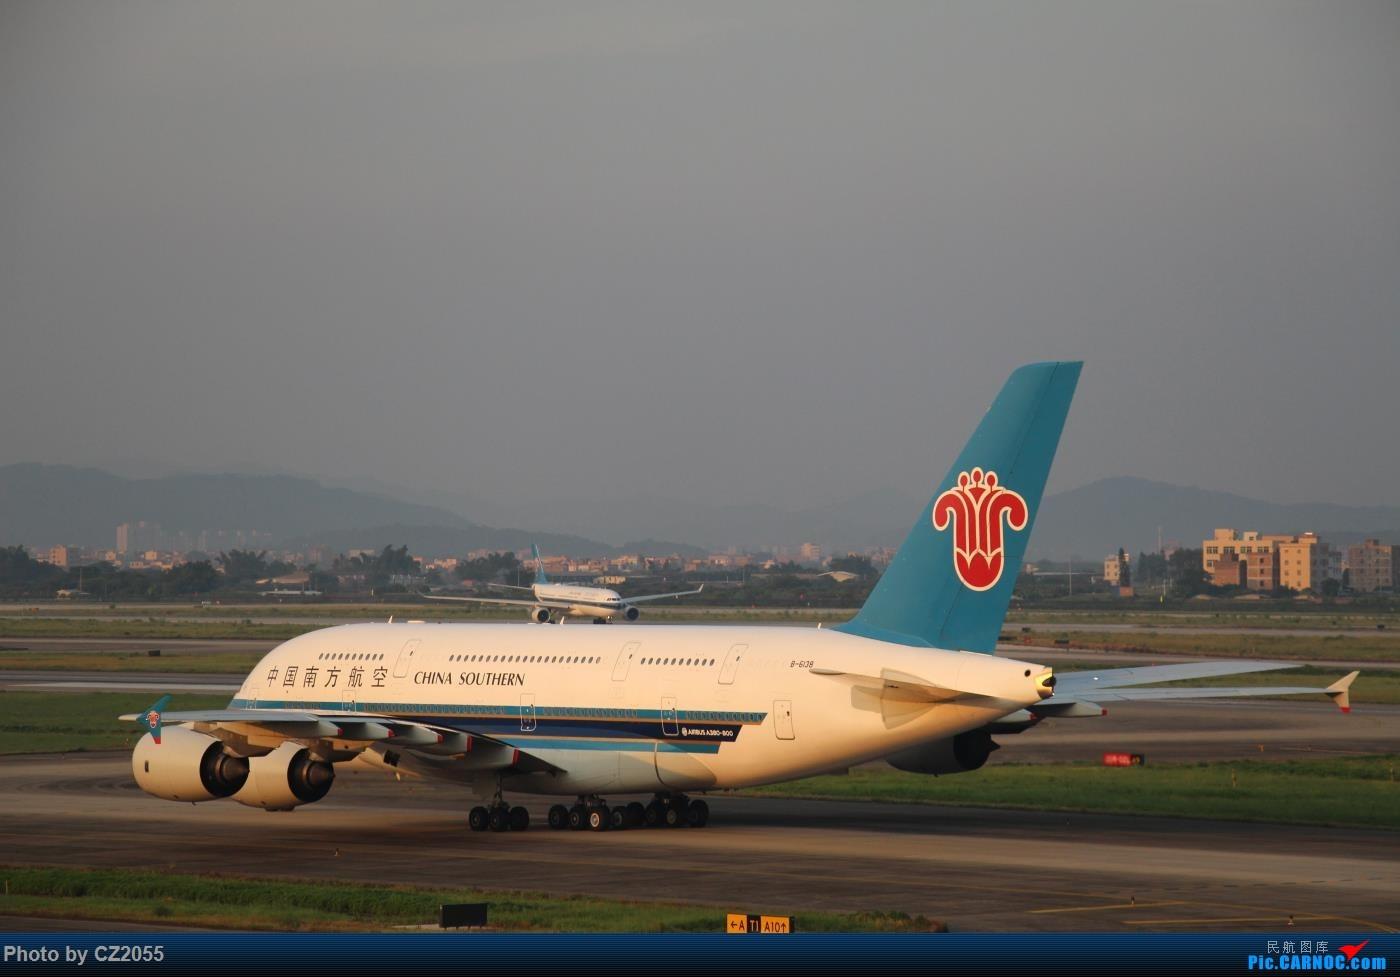 Re:[原创]【广东青少年拍机小队】【C-Z-2055】2015即将结束,来做个总结。 AIRBUS A380-800 B-6138 中国广州白云国际机场